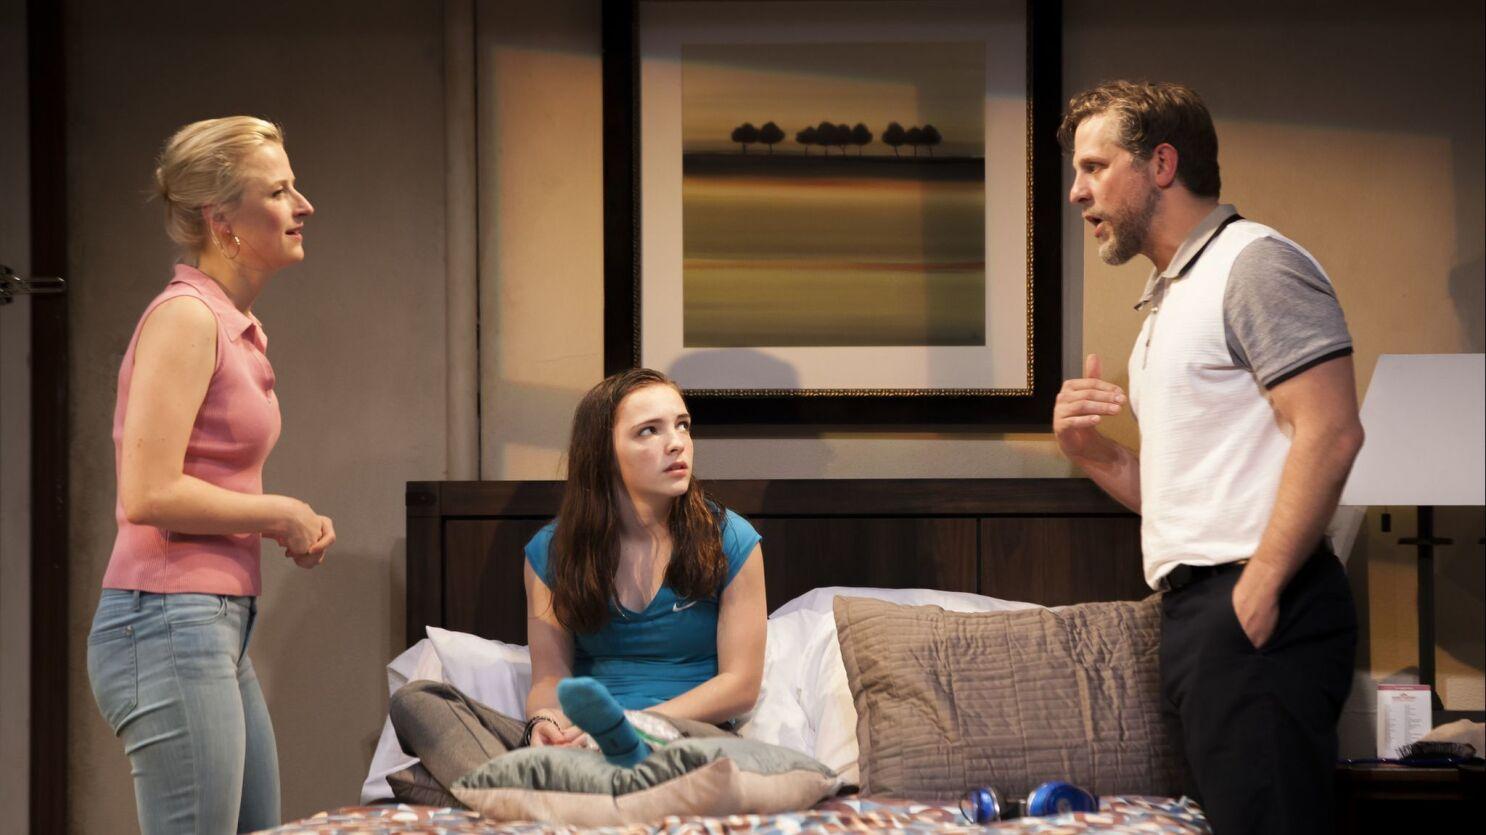 Amanda Peet Sex Scene review: amanda peet's 'our very own carlin mccullough': a